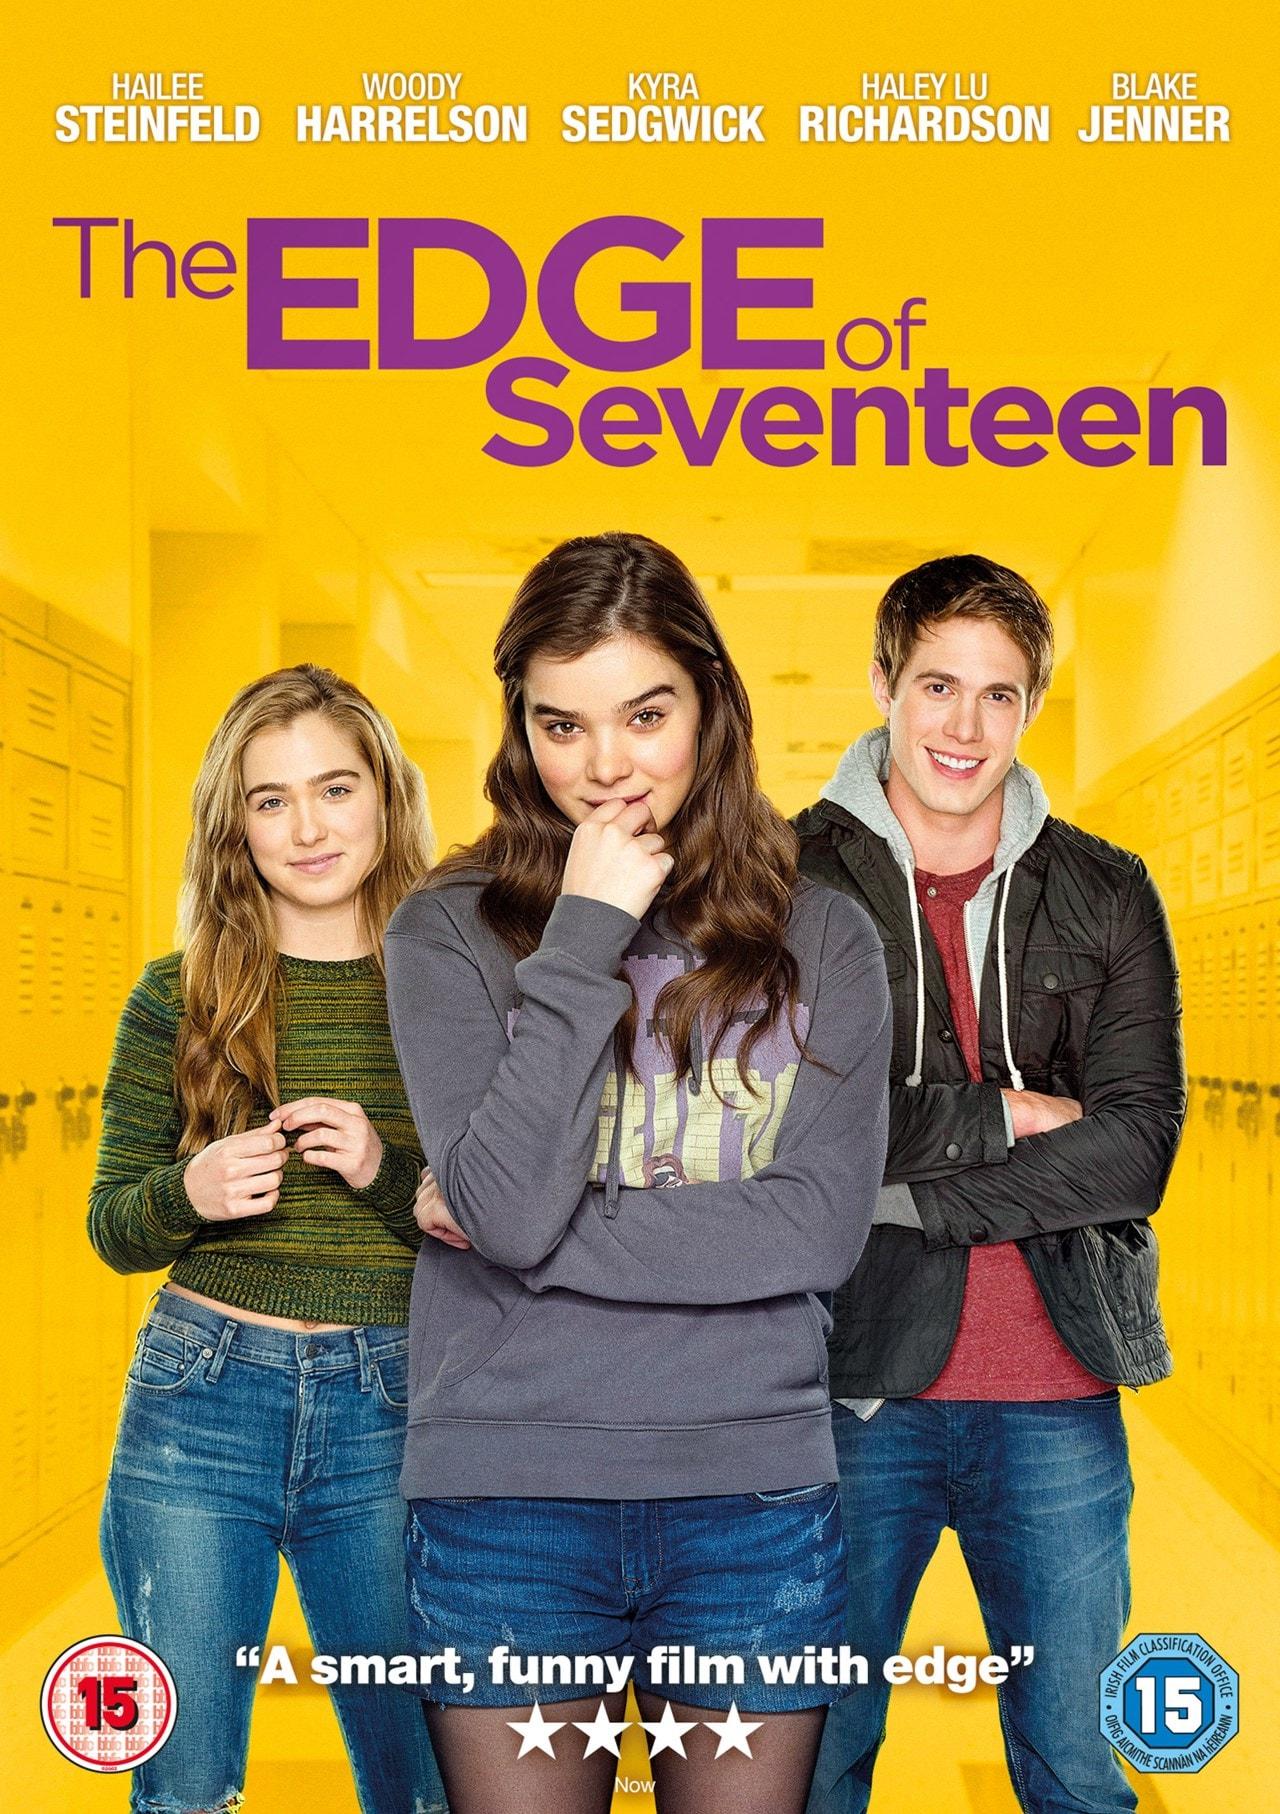 The Edge of Seventeen - 1